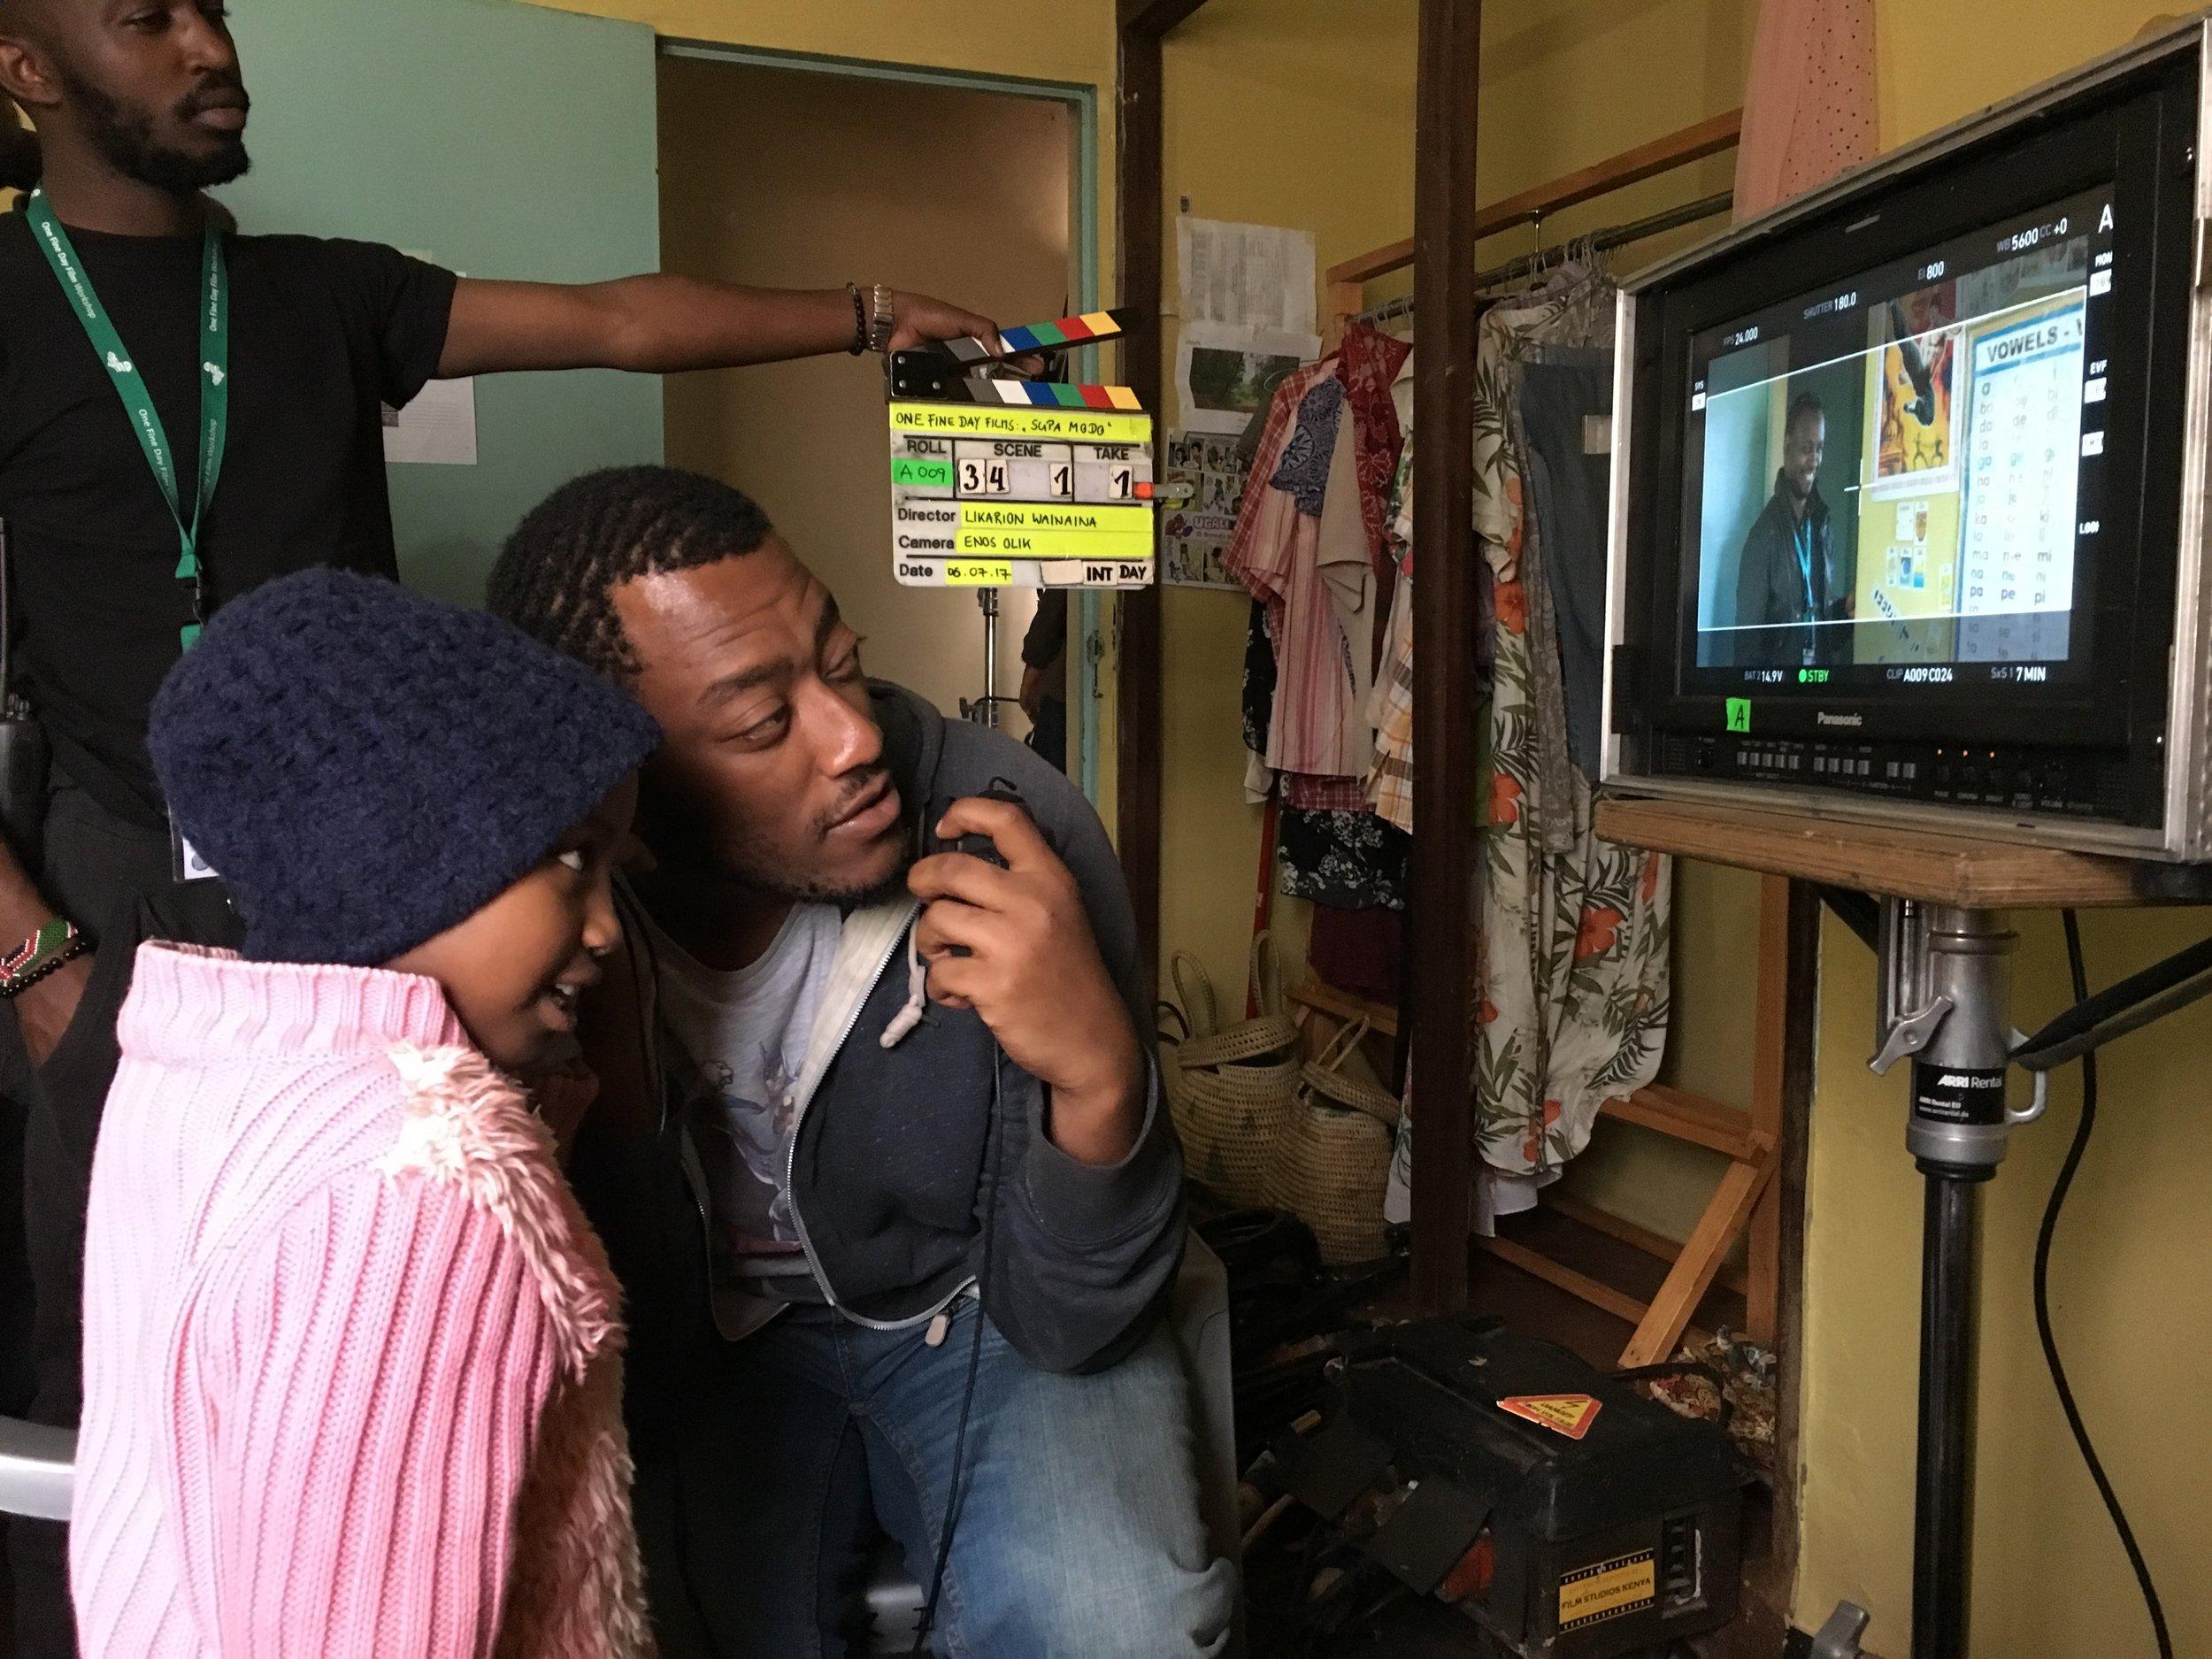 Director Likarion Wainaina and Stycy Waweru.